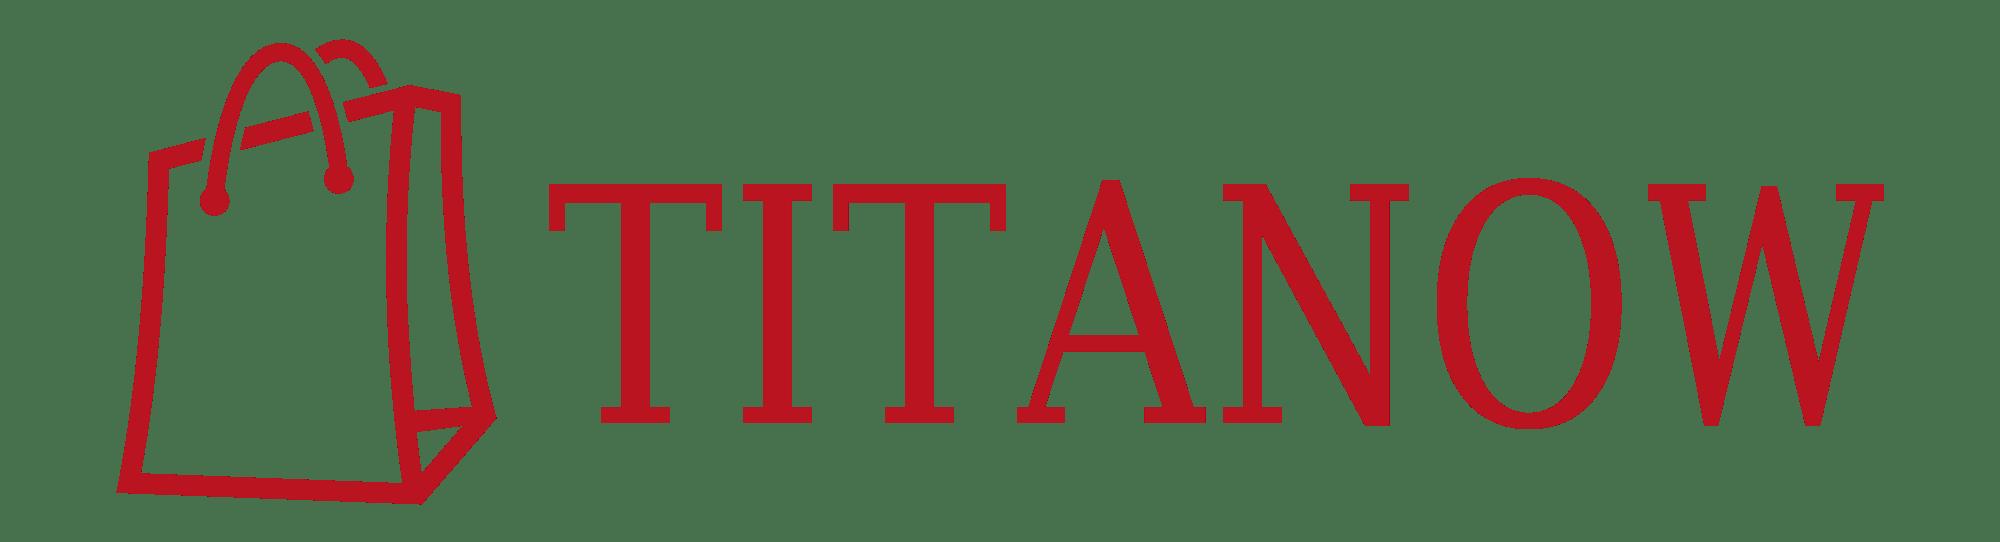 titanow